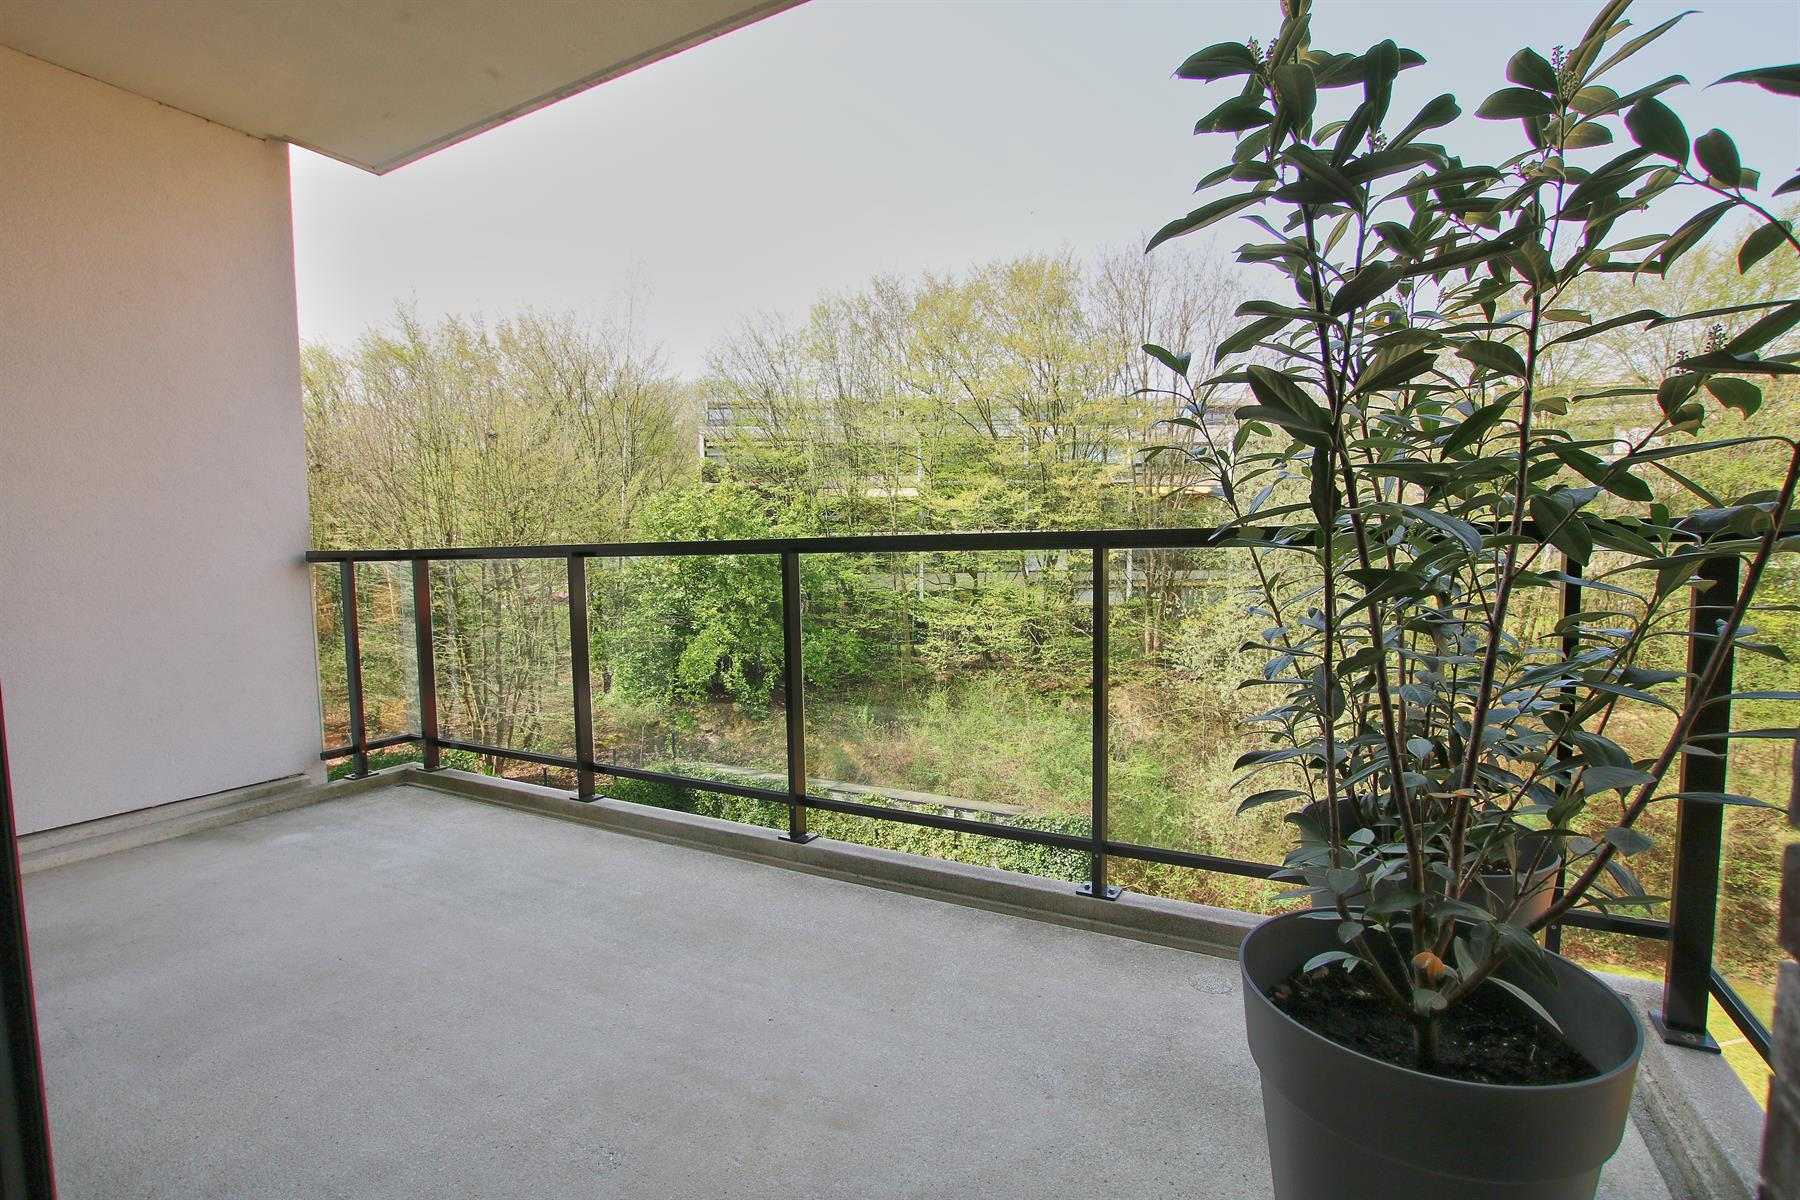 Appartement - Woluwe-Saint-Lambert - #4324368-25